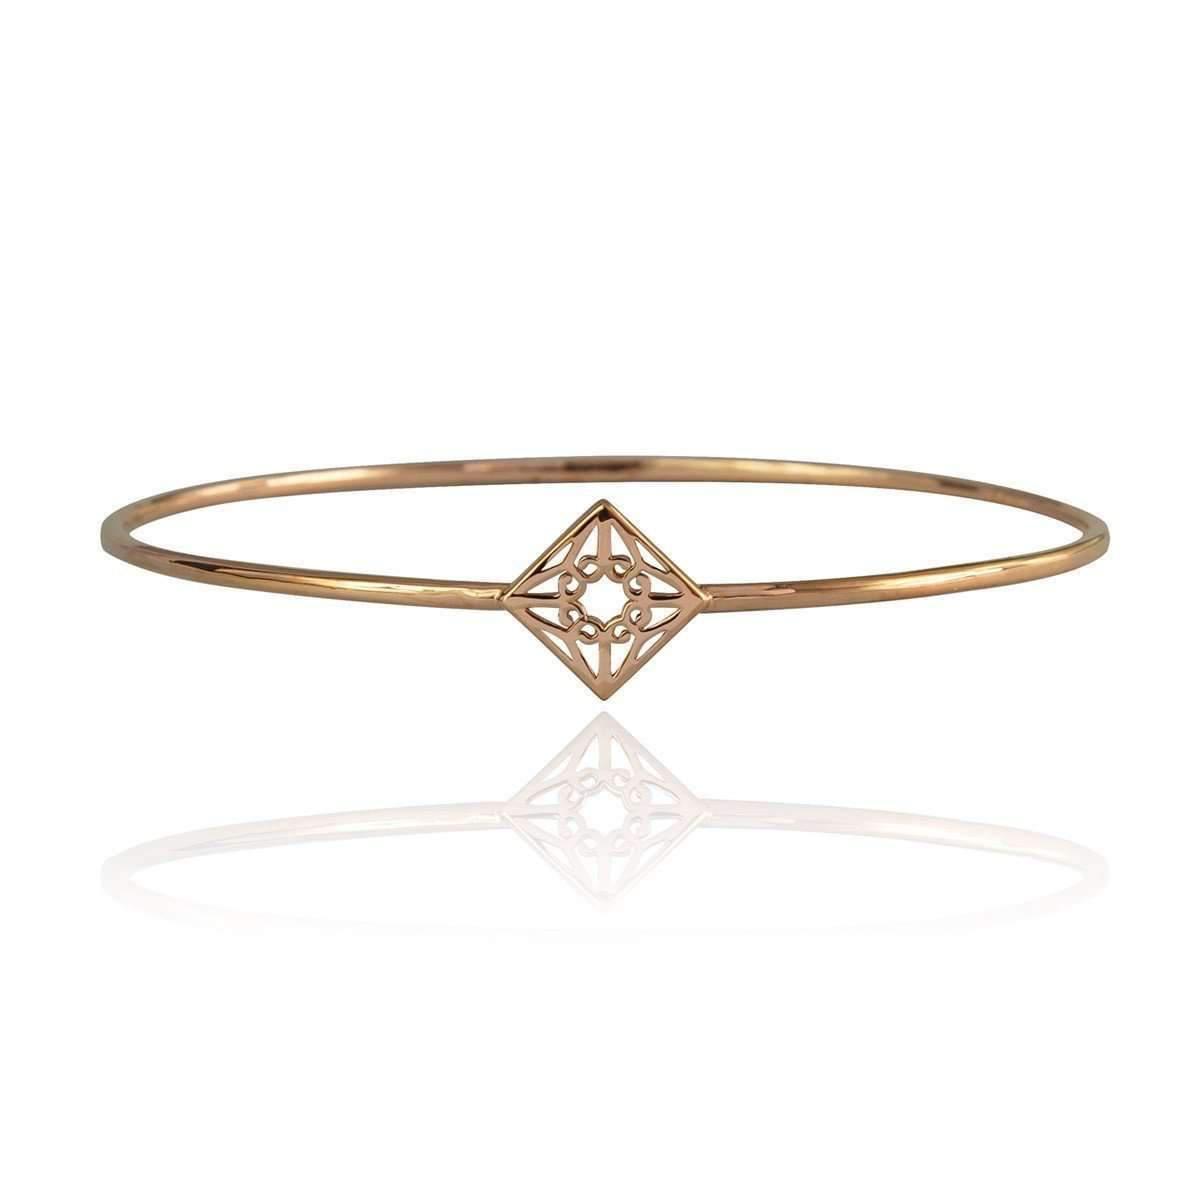 Zefyr Lao Bangle Rose Gold - Medium (65mm diameter) QAyksC